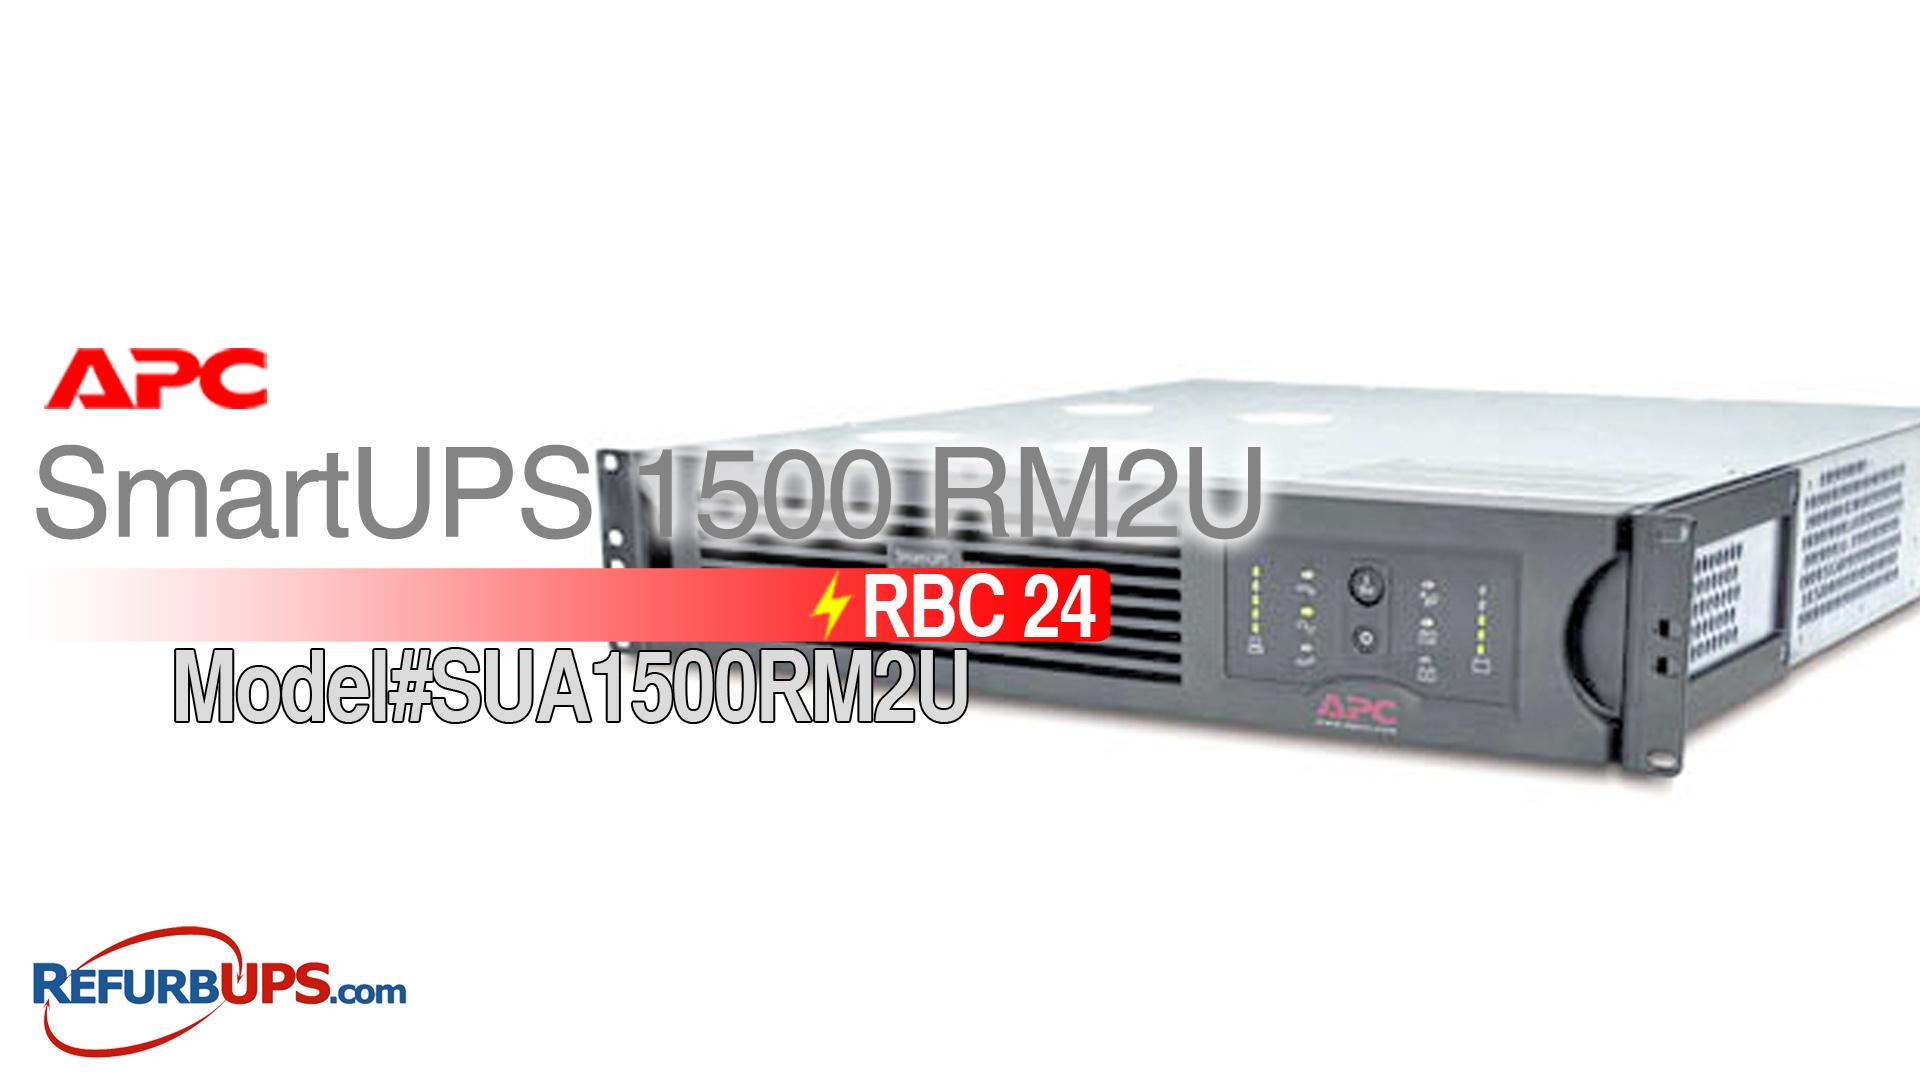 APC RBC 24 in APC SmartUPS 1500RM2U